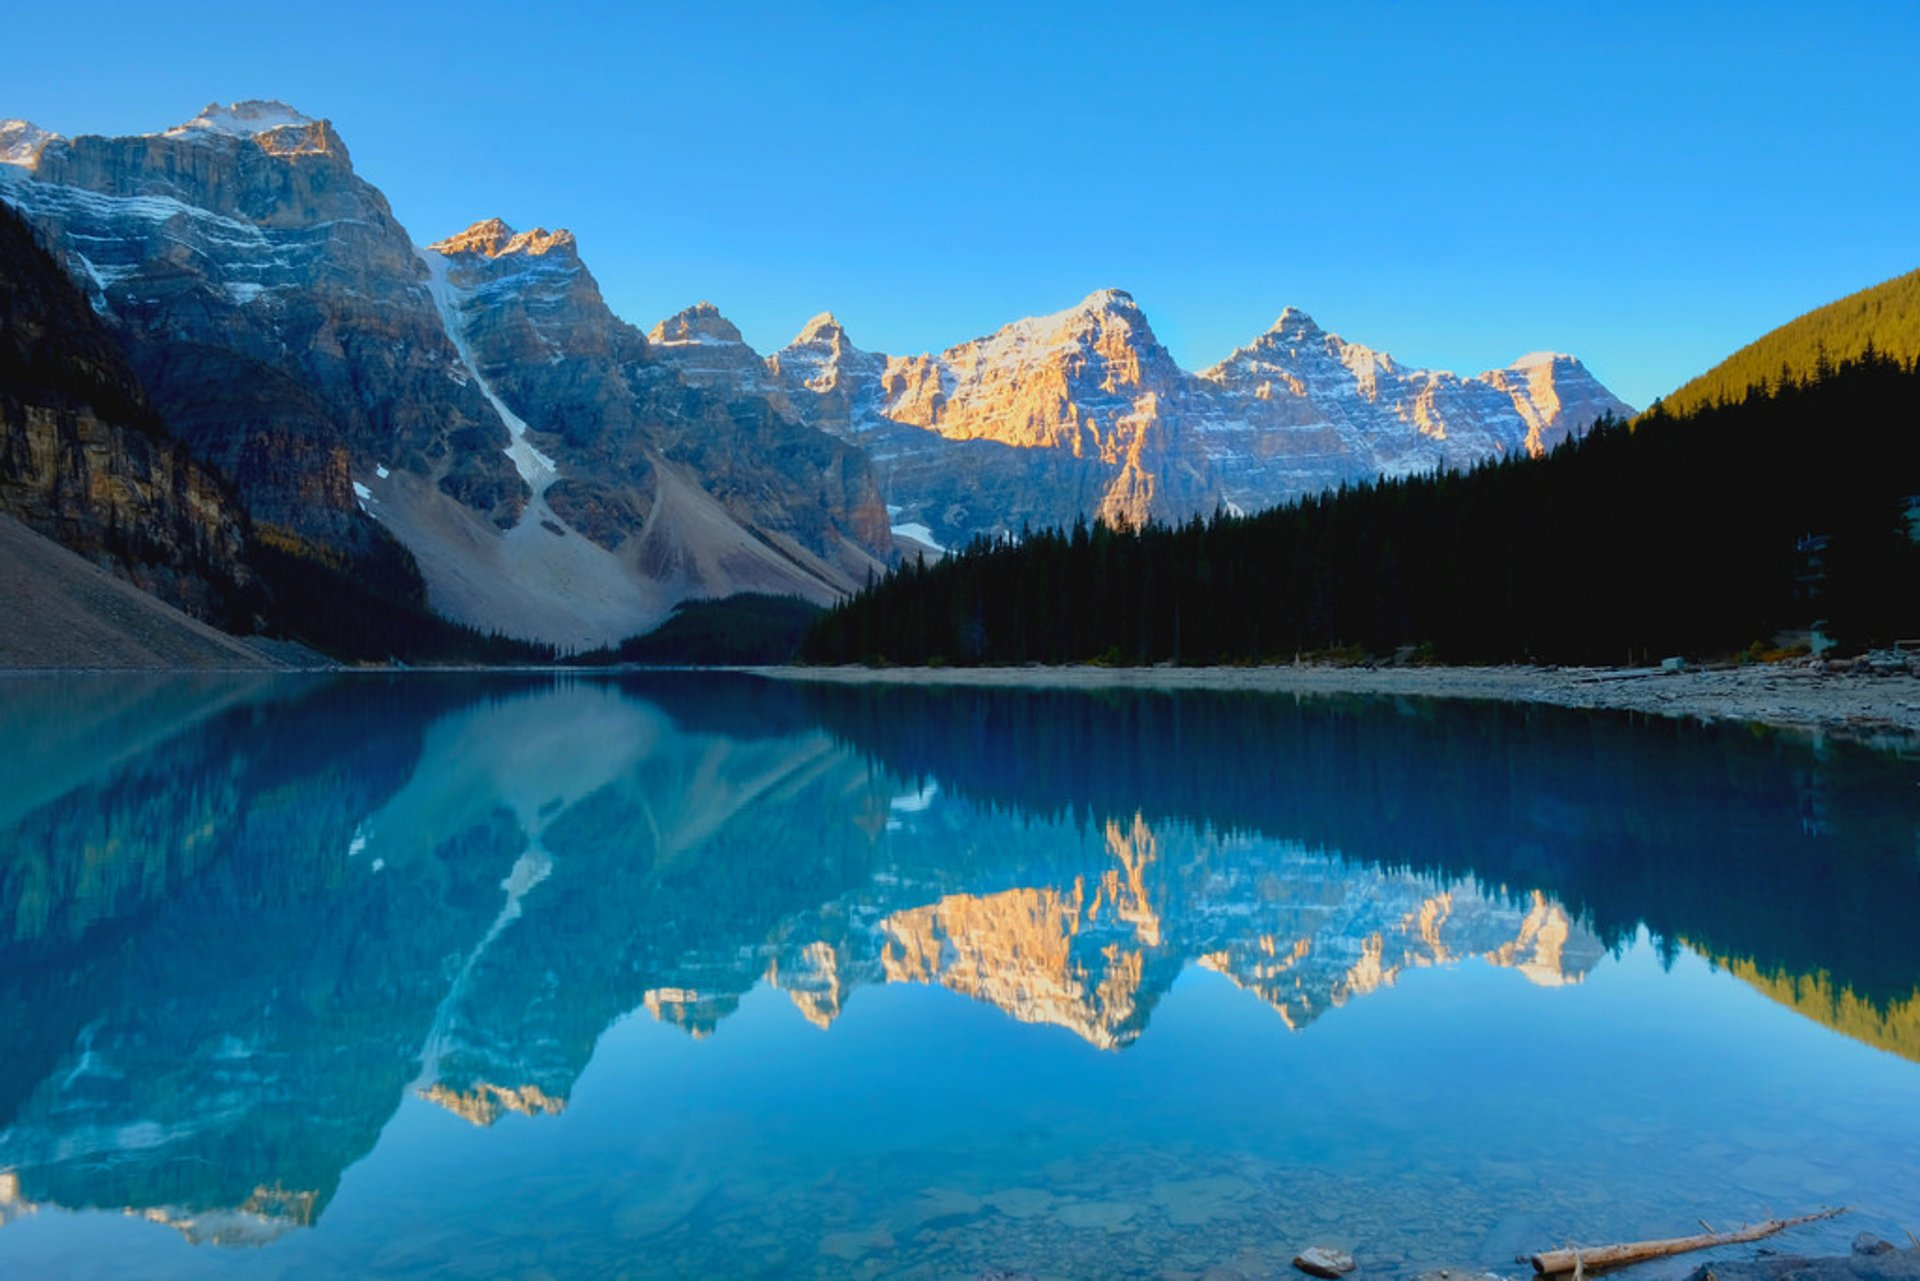 Moraine Lake in Banff & Jasper National Parks 2020 - Best Time